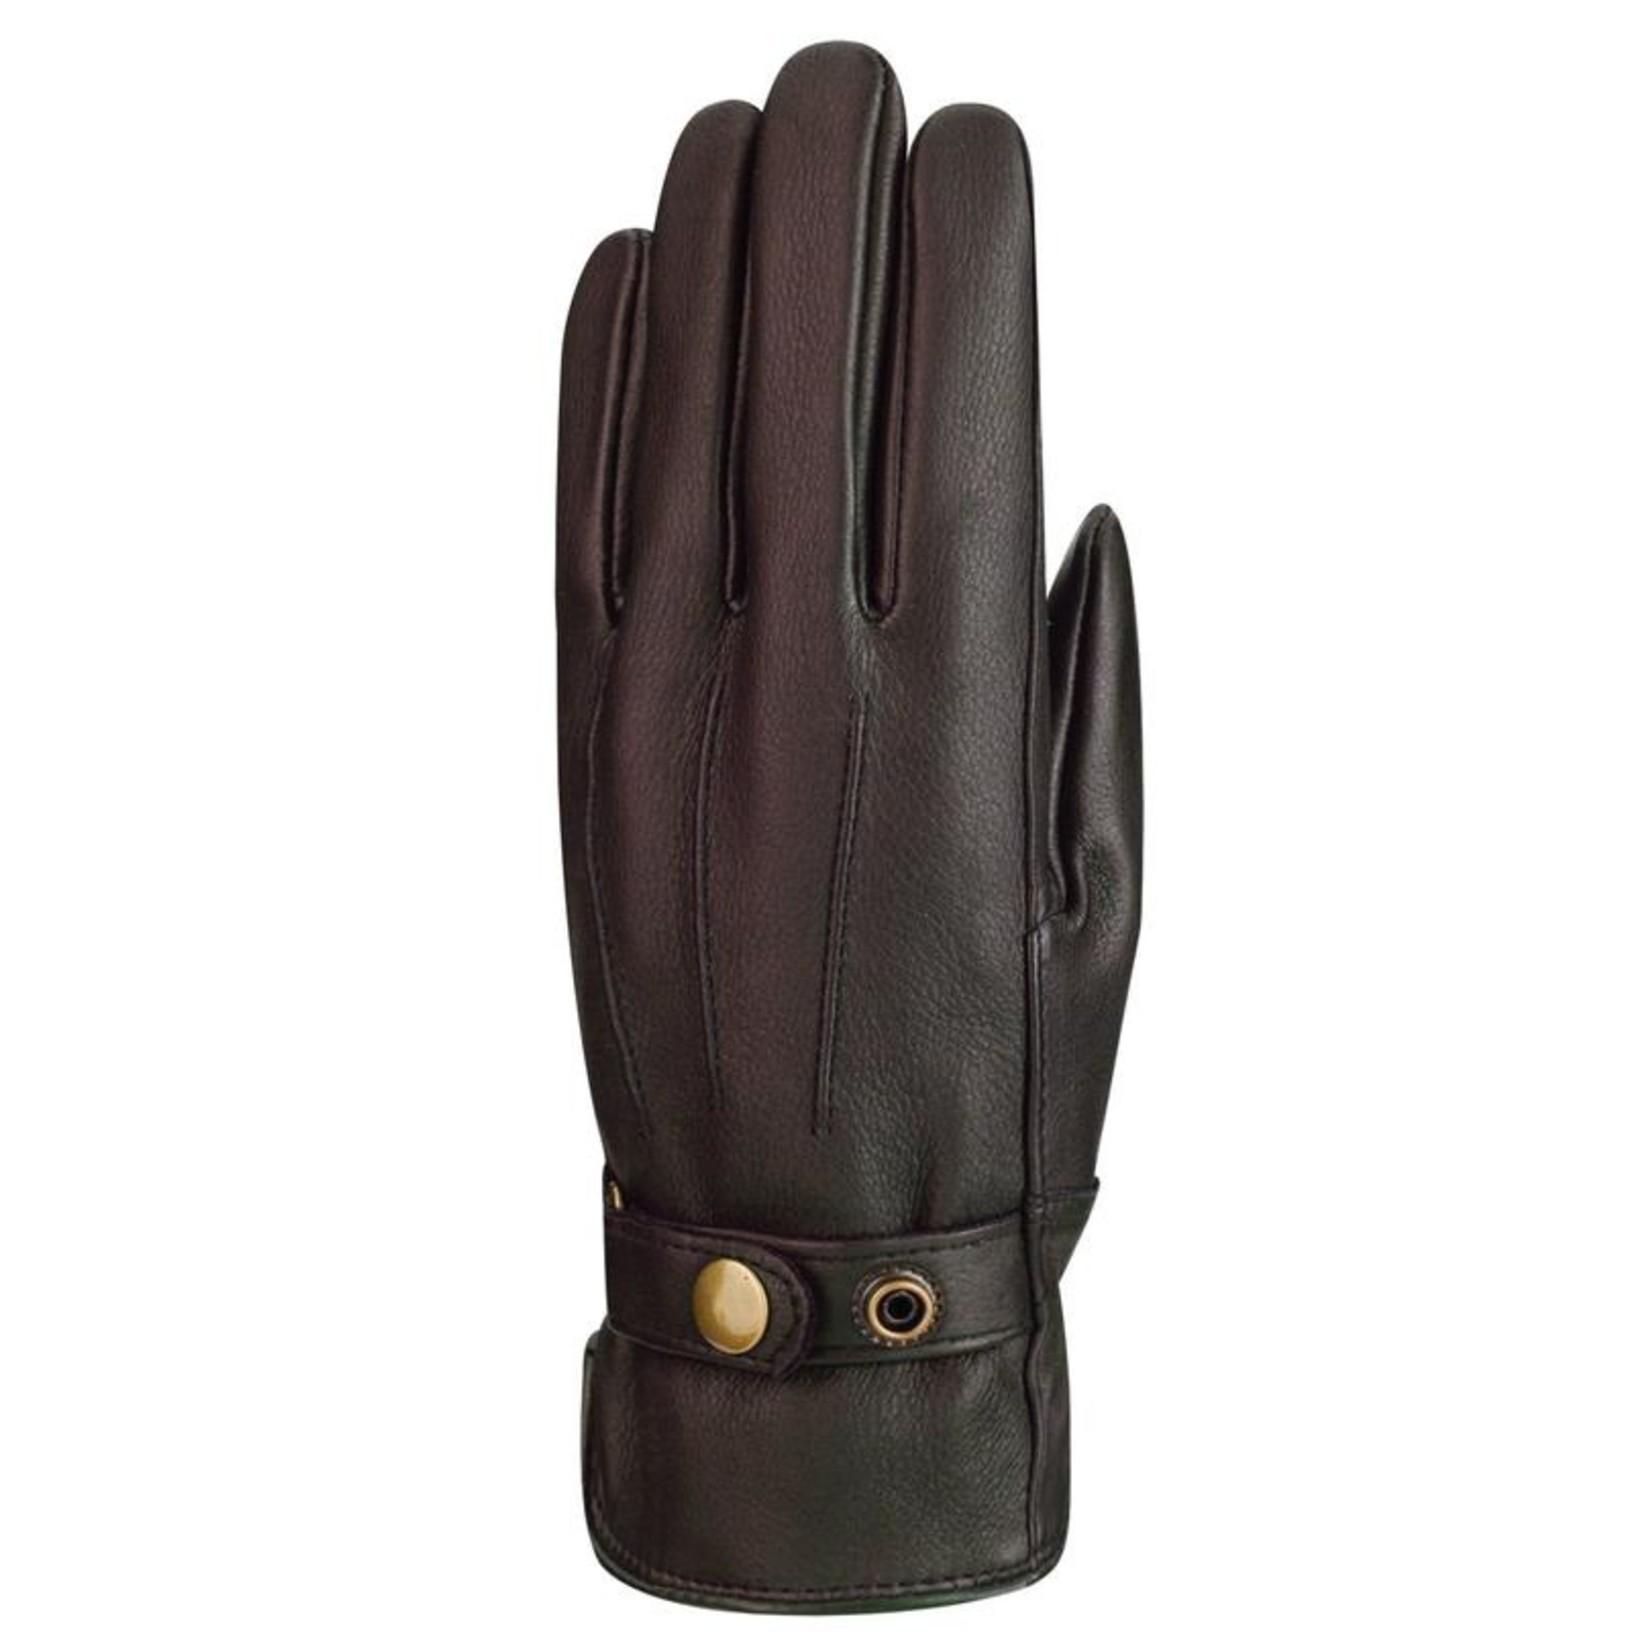 Auclair Auclair 6G514 Brody Paris Gloves - 2 Colors